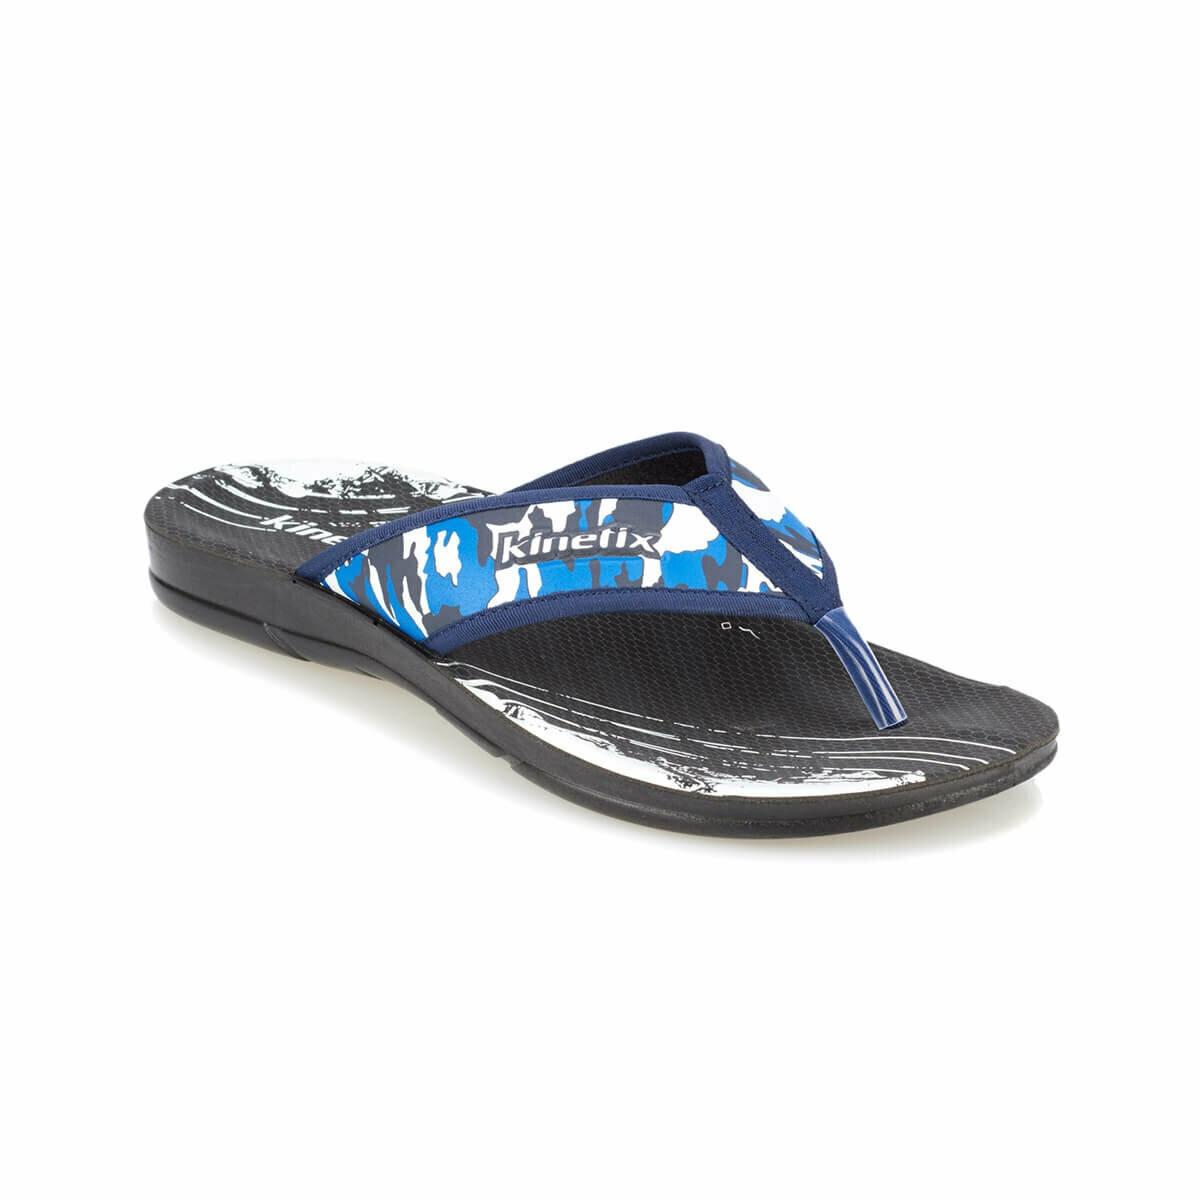 FLO MEDELIN Navy Blue Male Slippers KINETIX